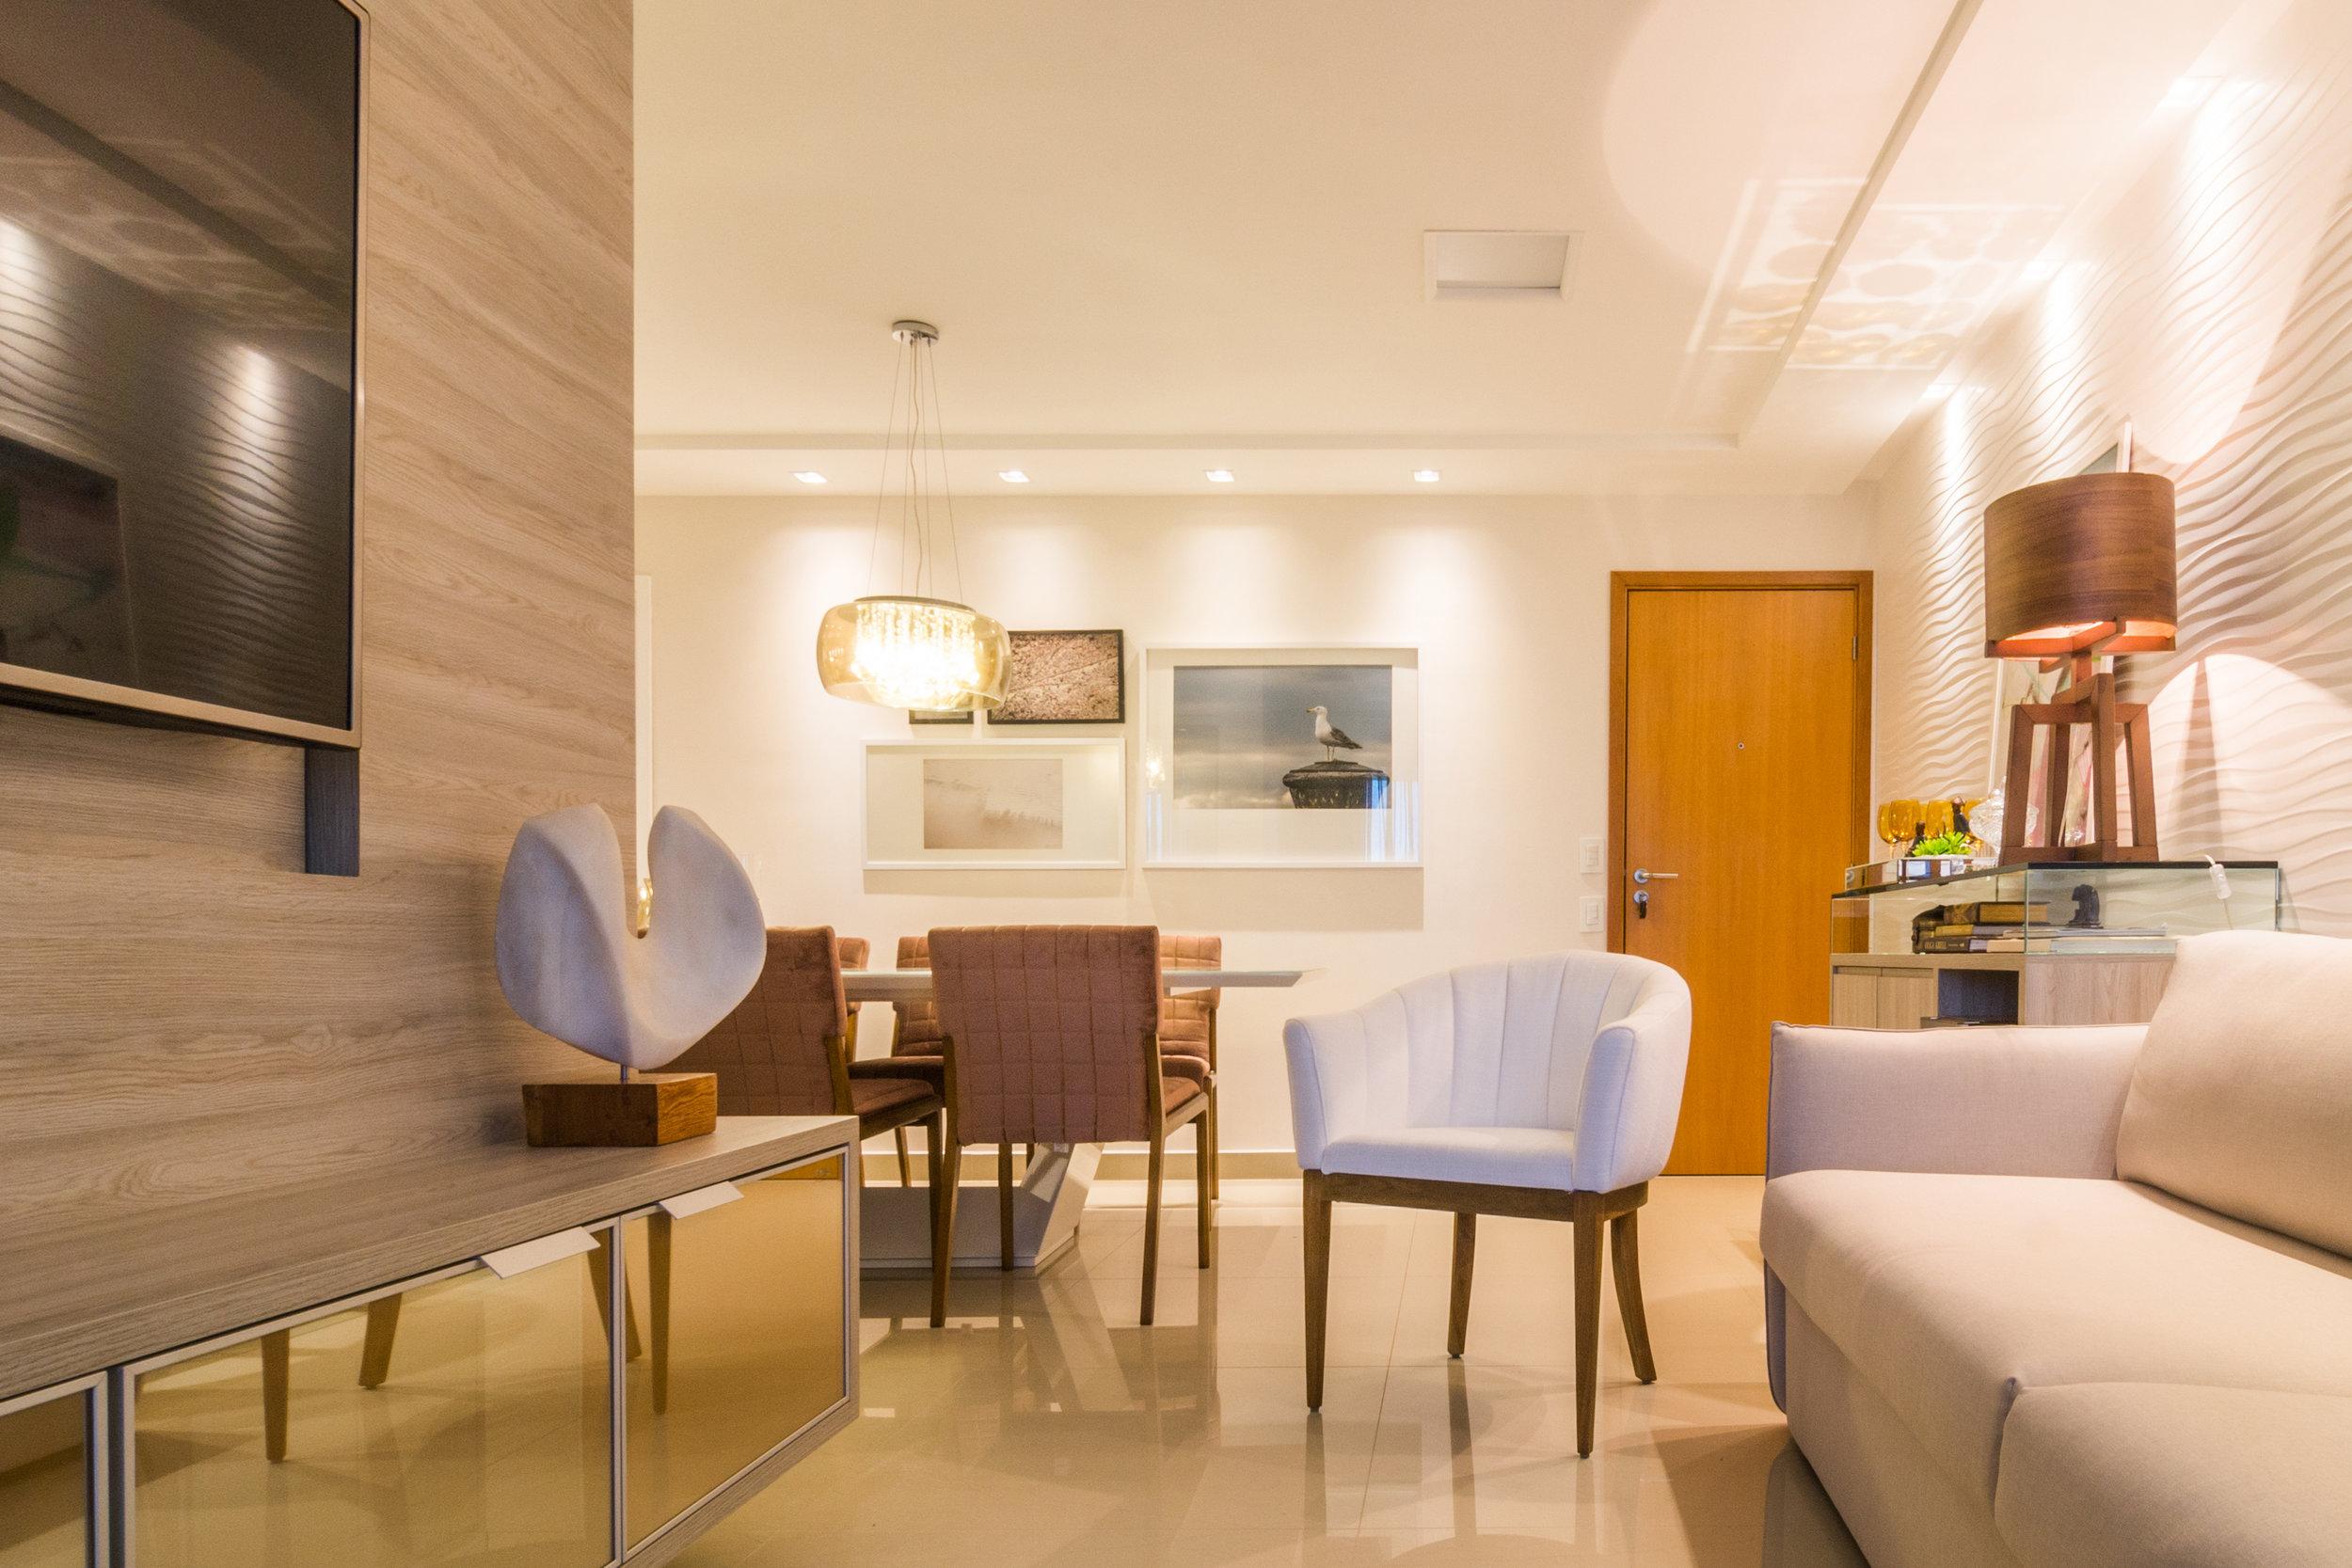 projeto-arquitetonico-rafaeldebora-duo-arquitetura-apartamentos-013.jpg